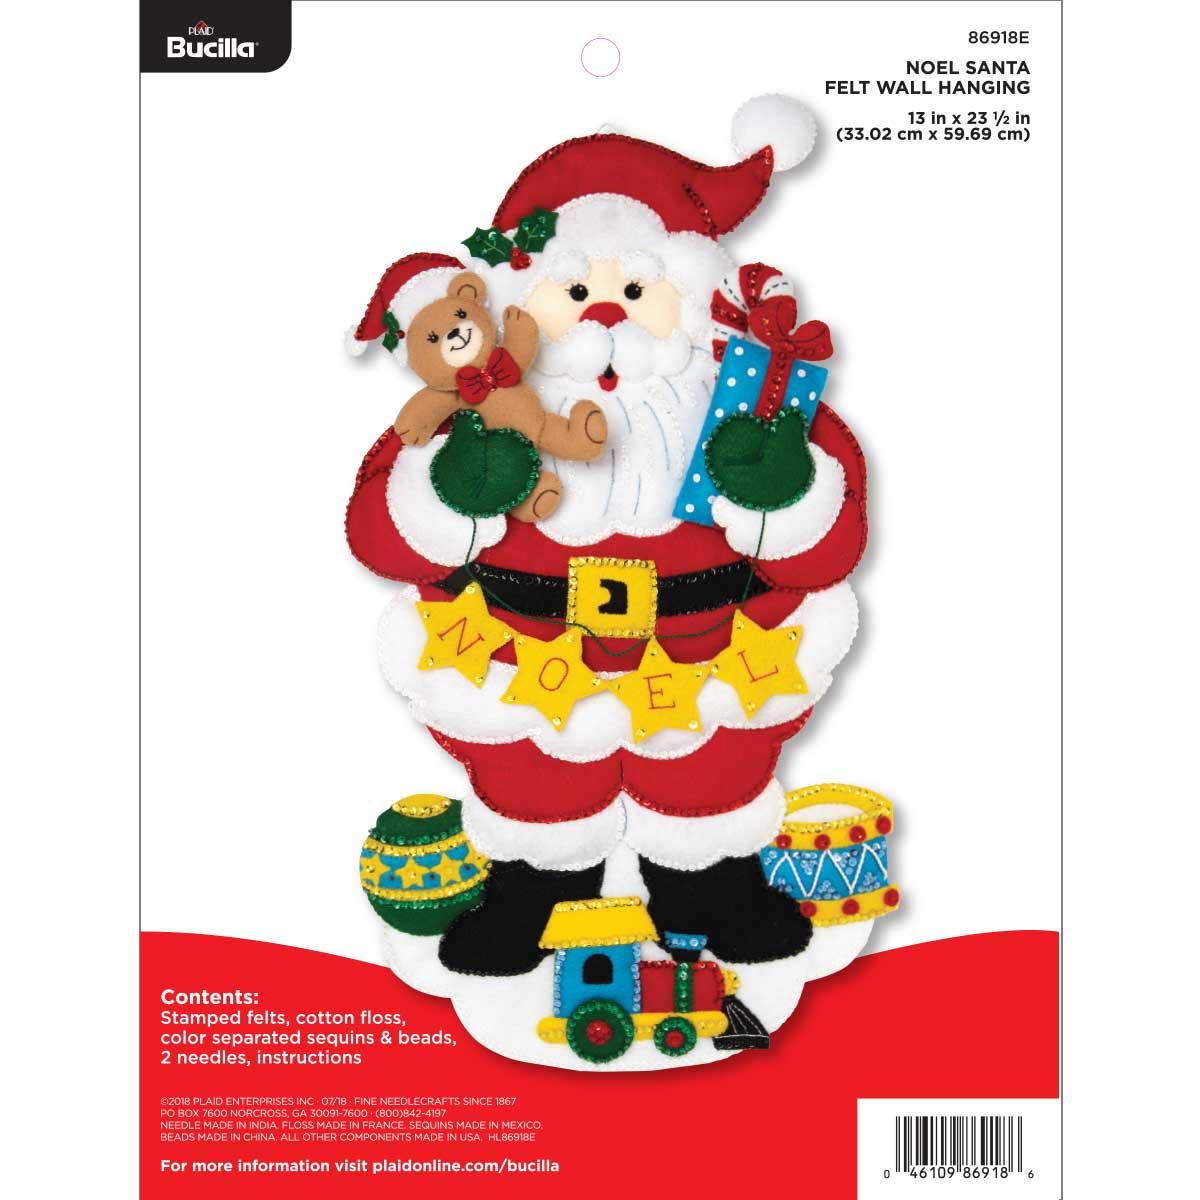 Bucilla ® Seasonal - Felt - Home Decor - Noel Santa Wall Hanging